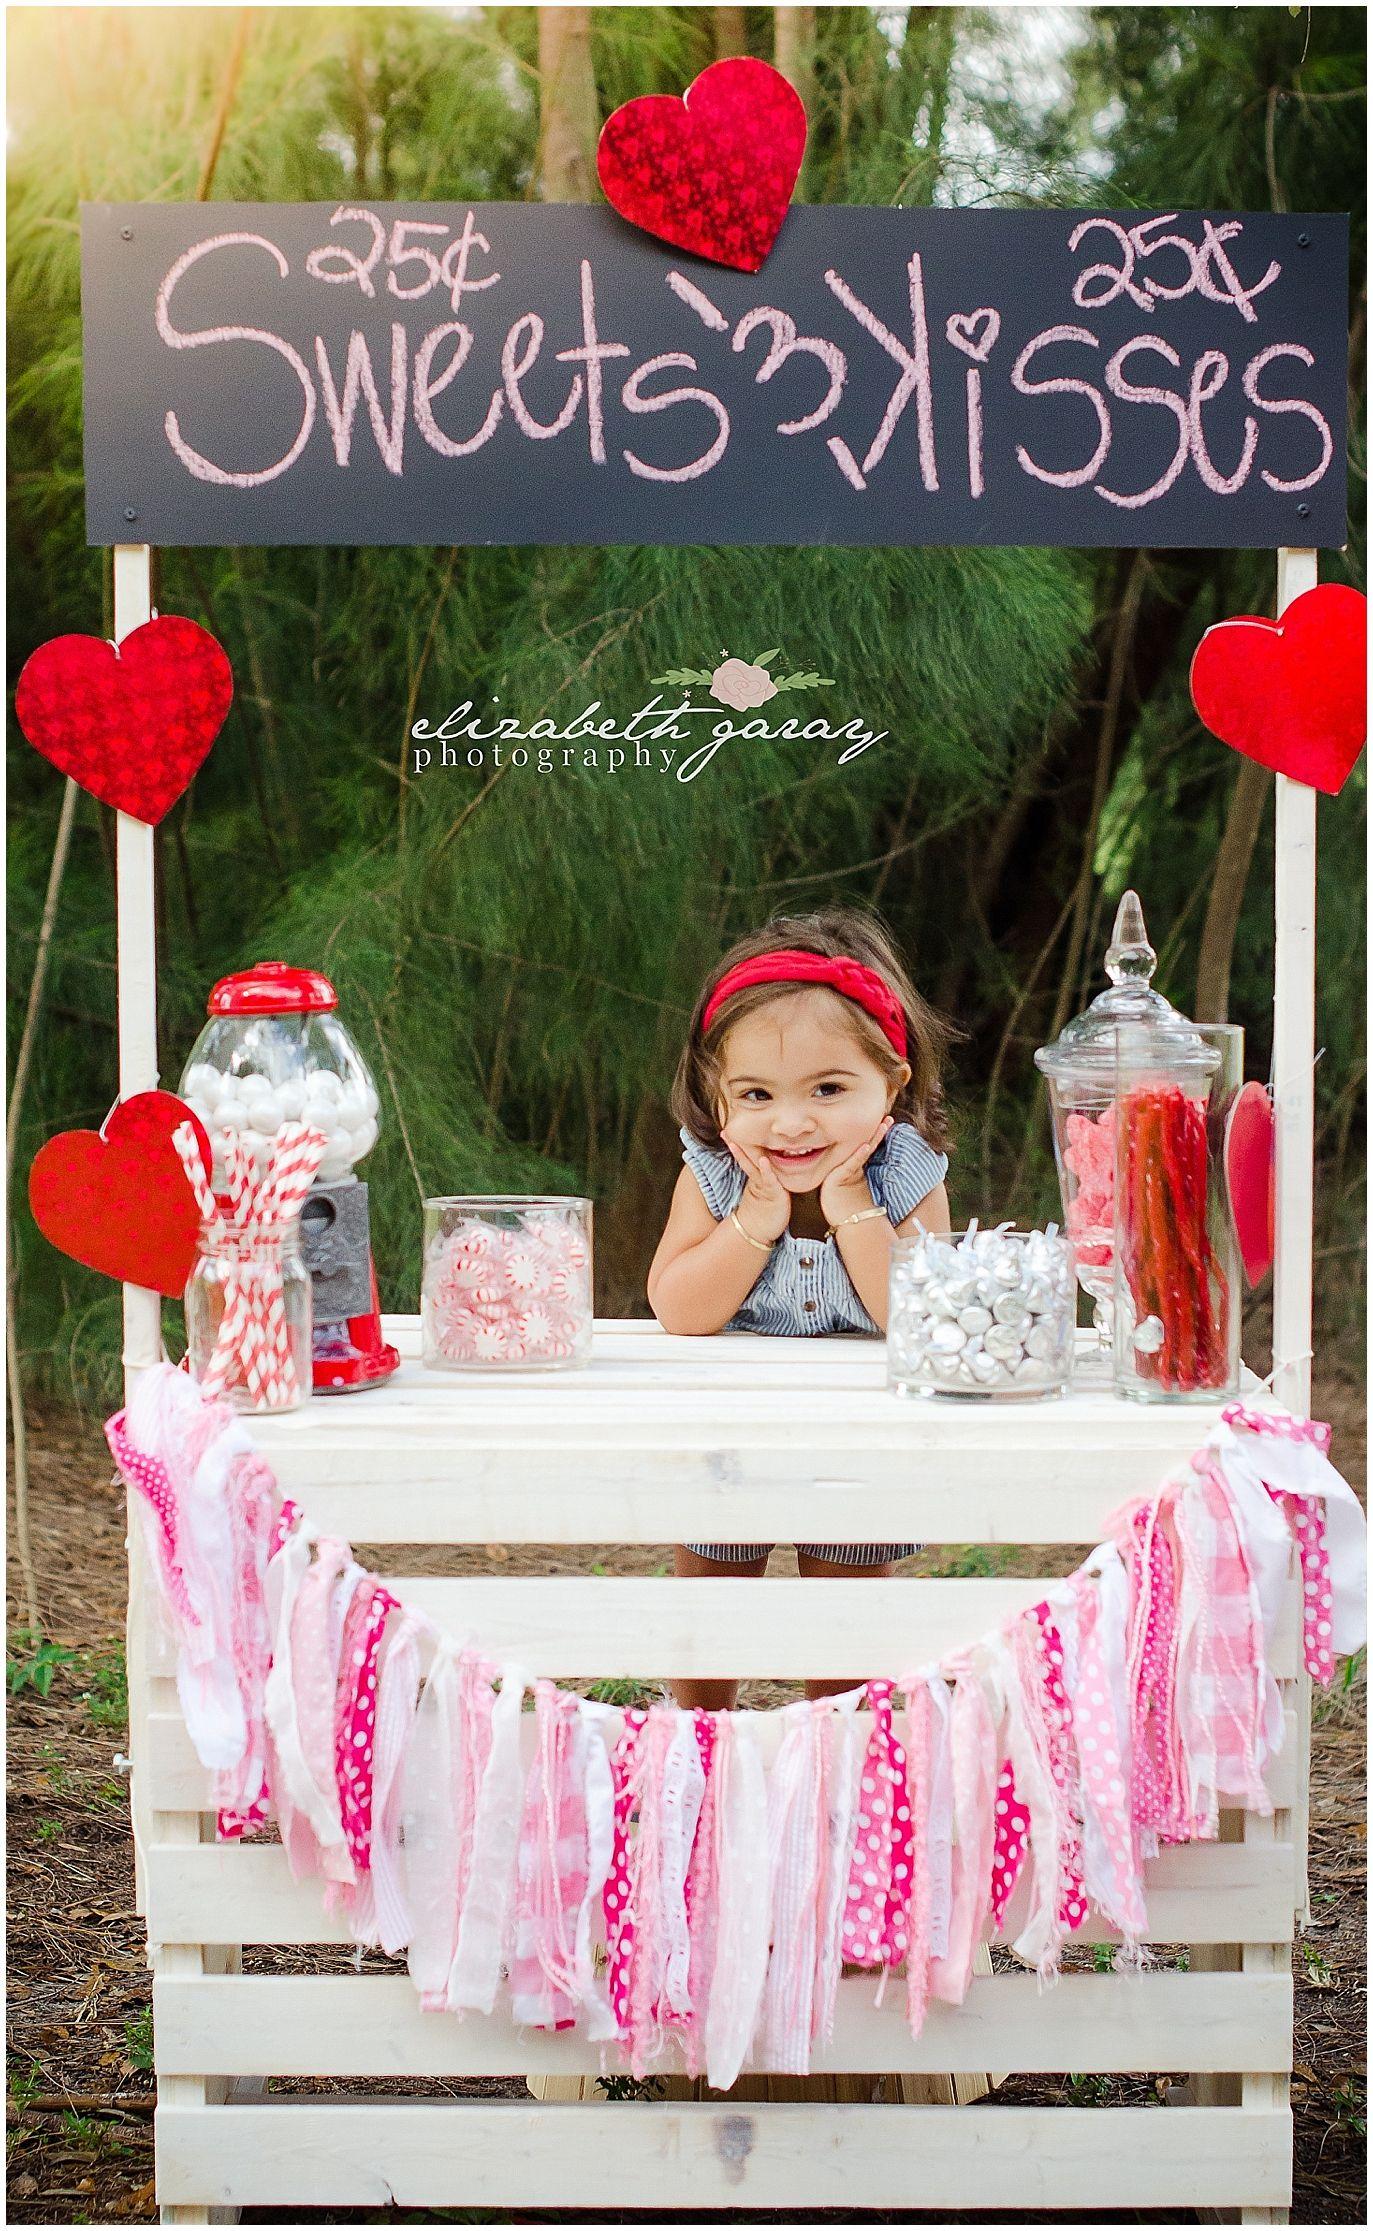 Valentine Photo Shoot Sweet Kissing Booth Elizabeth Garay